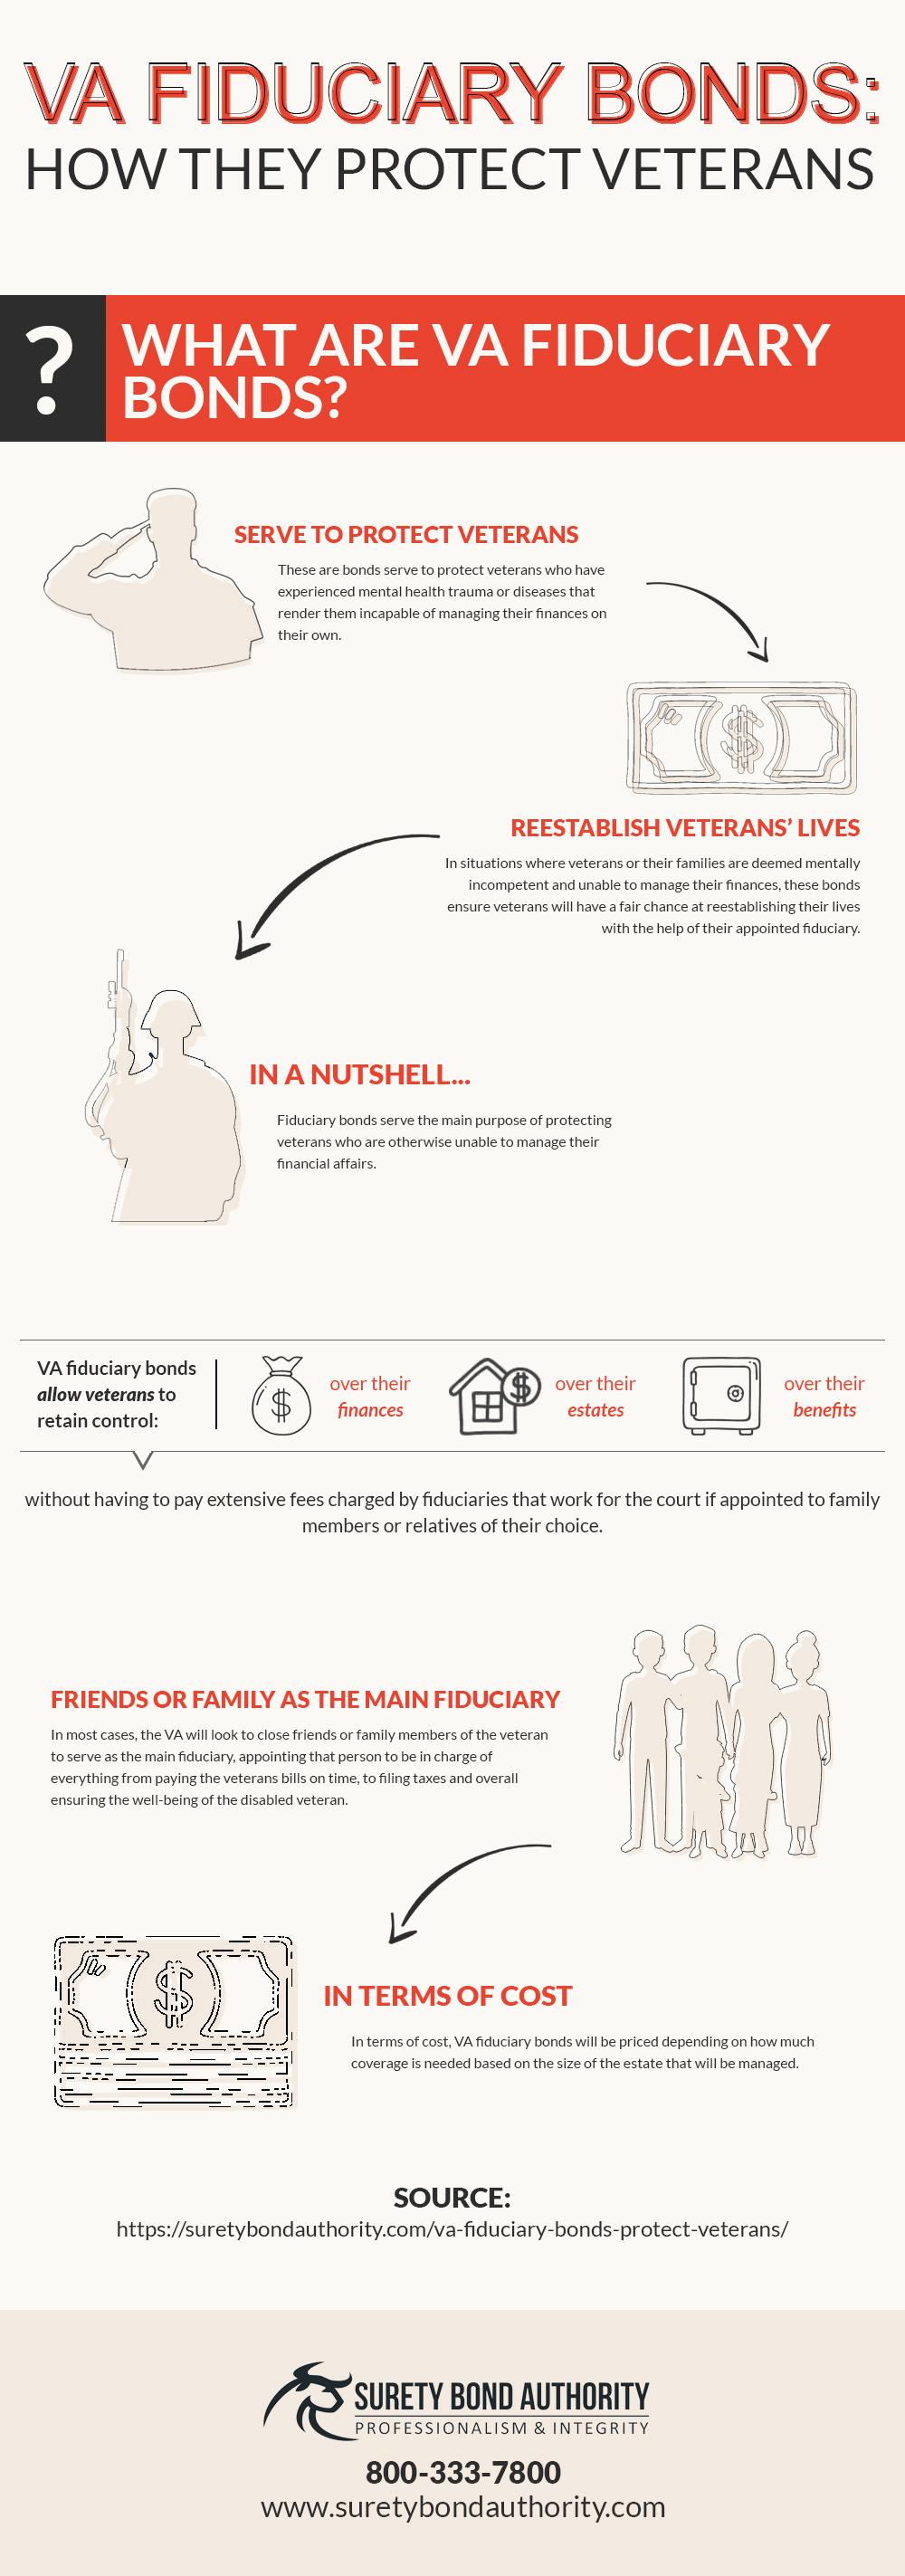 VA Fiduciary Bonds Infographic